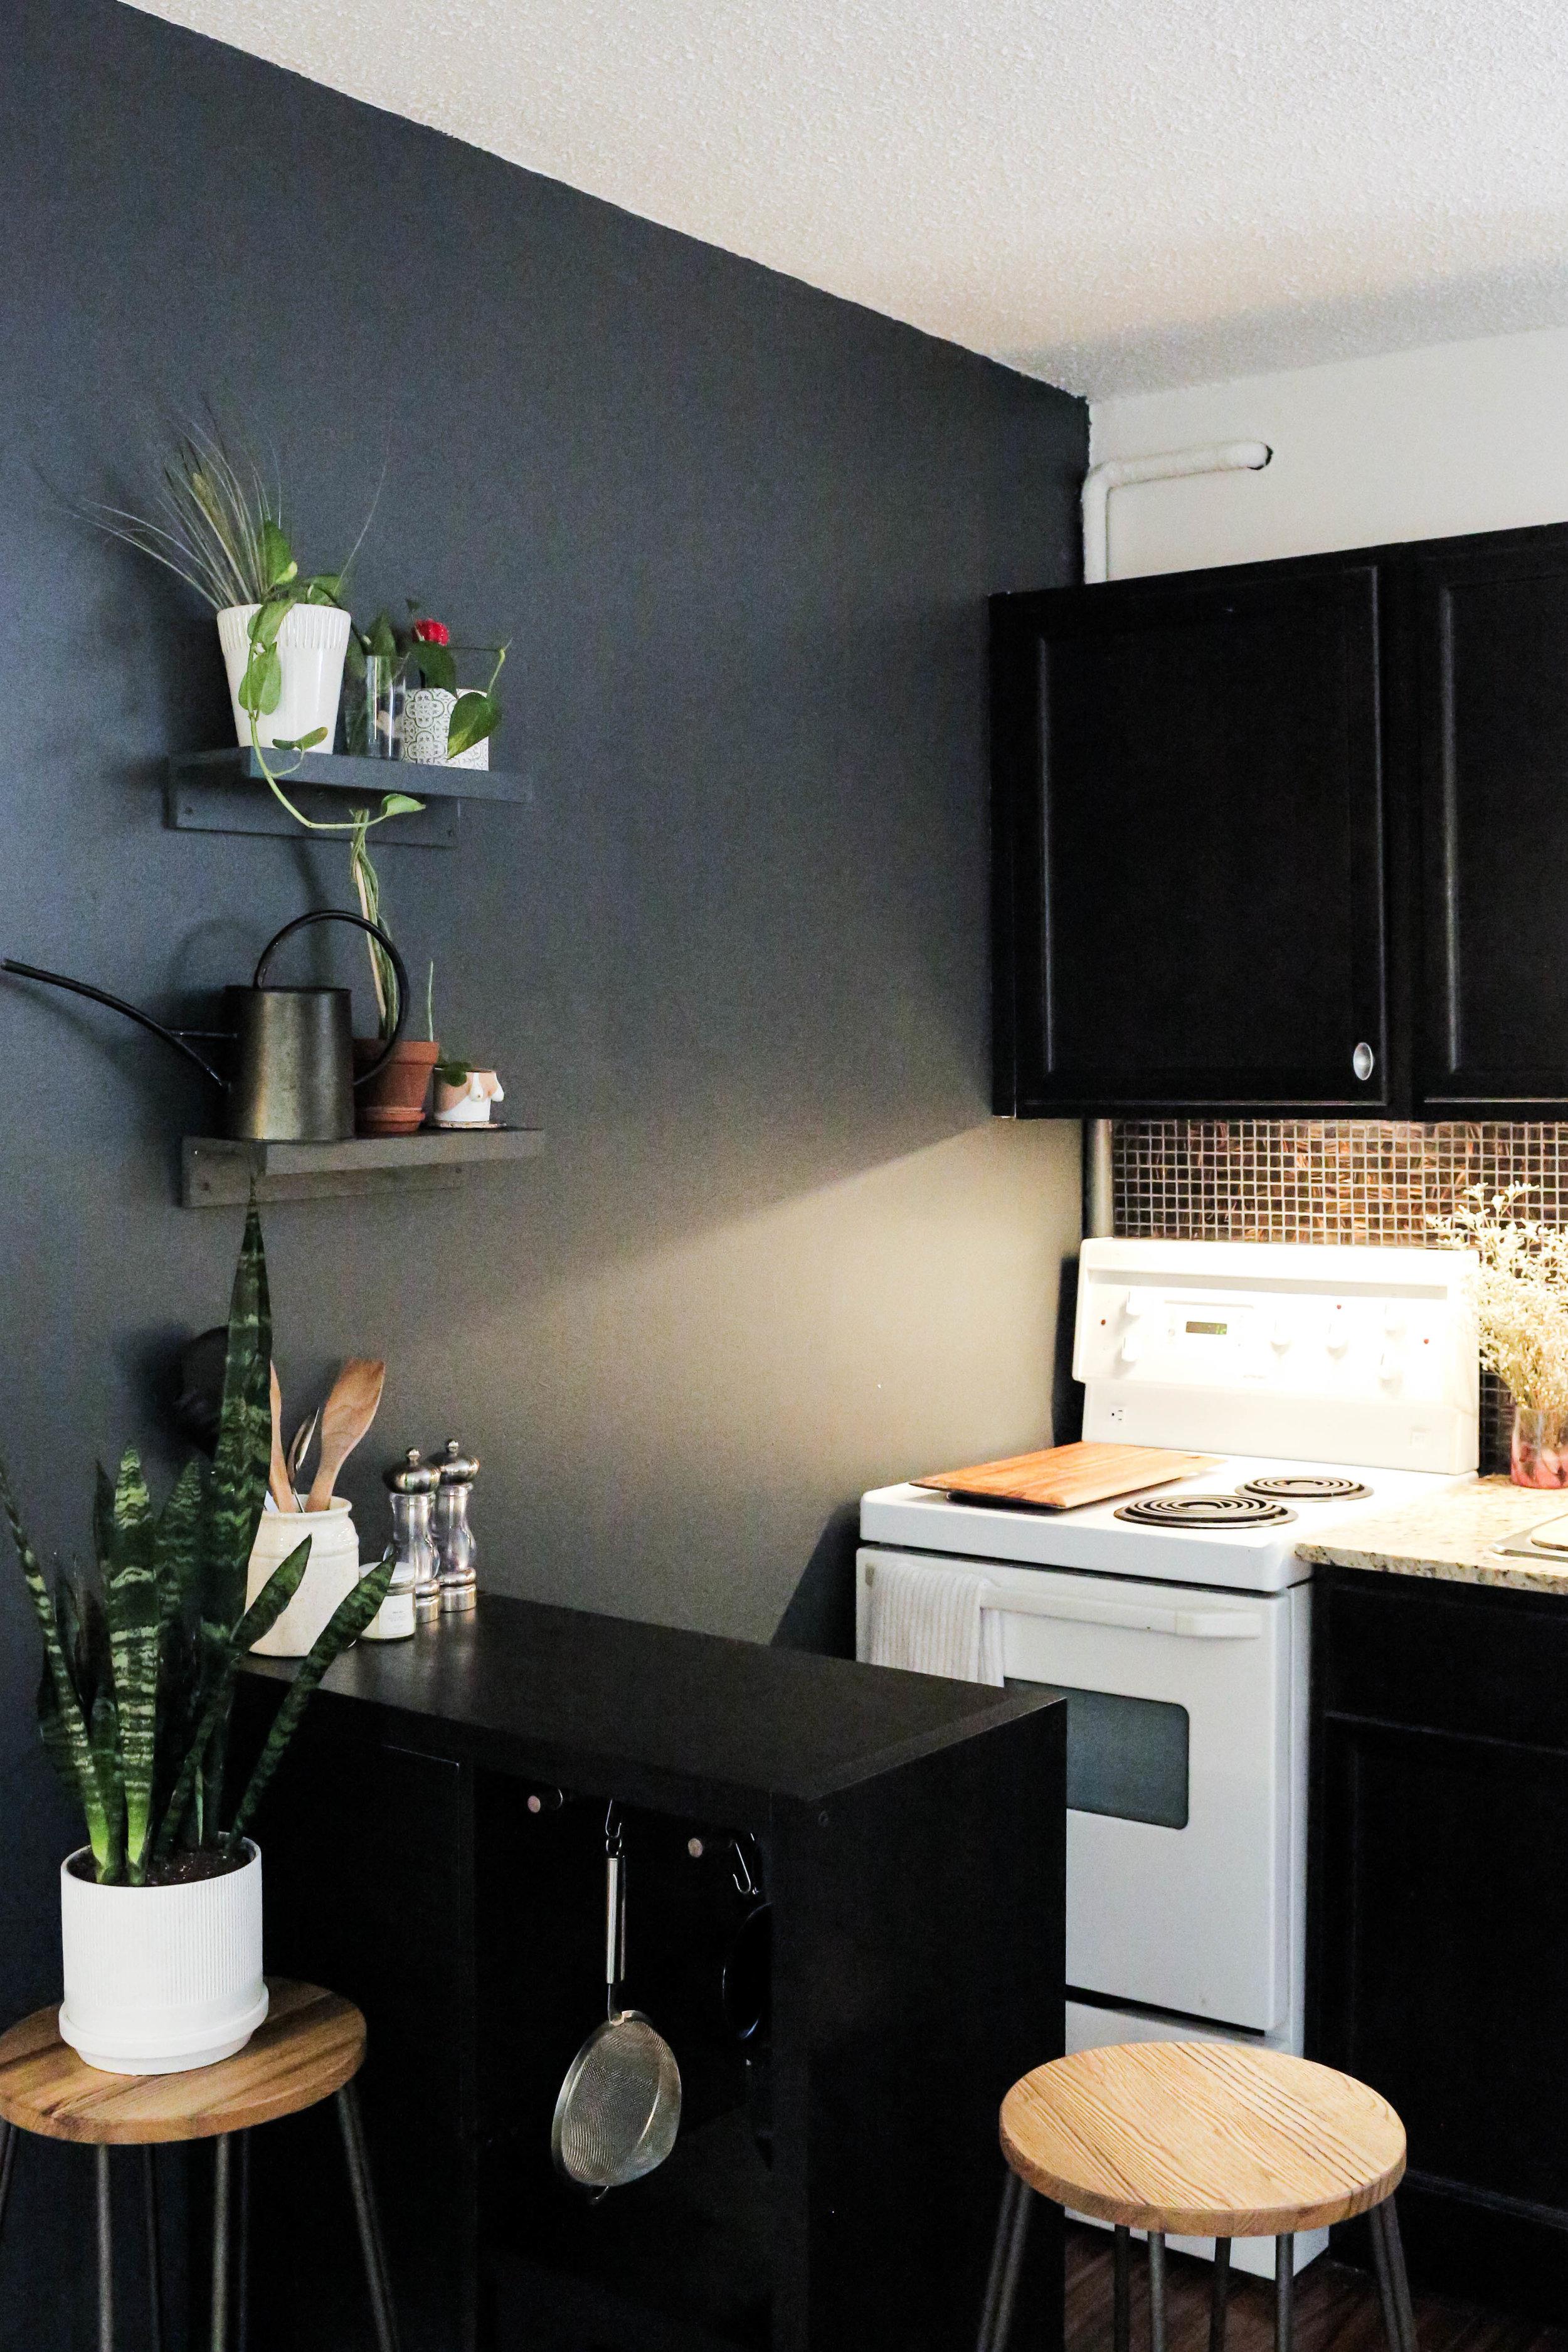 ApartmentMakeover-13.jpg